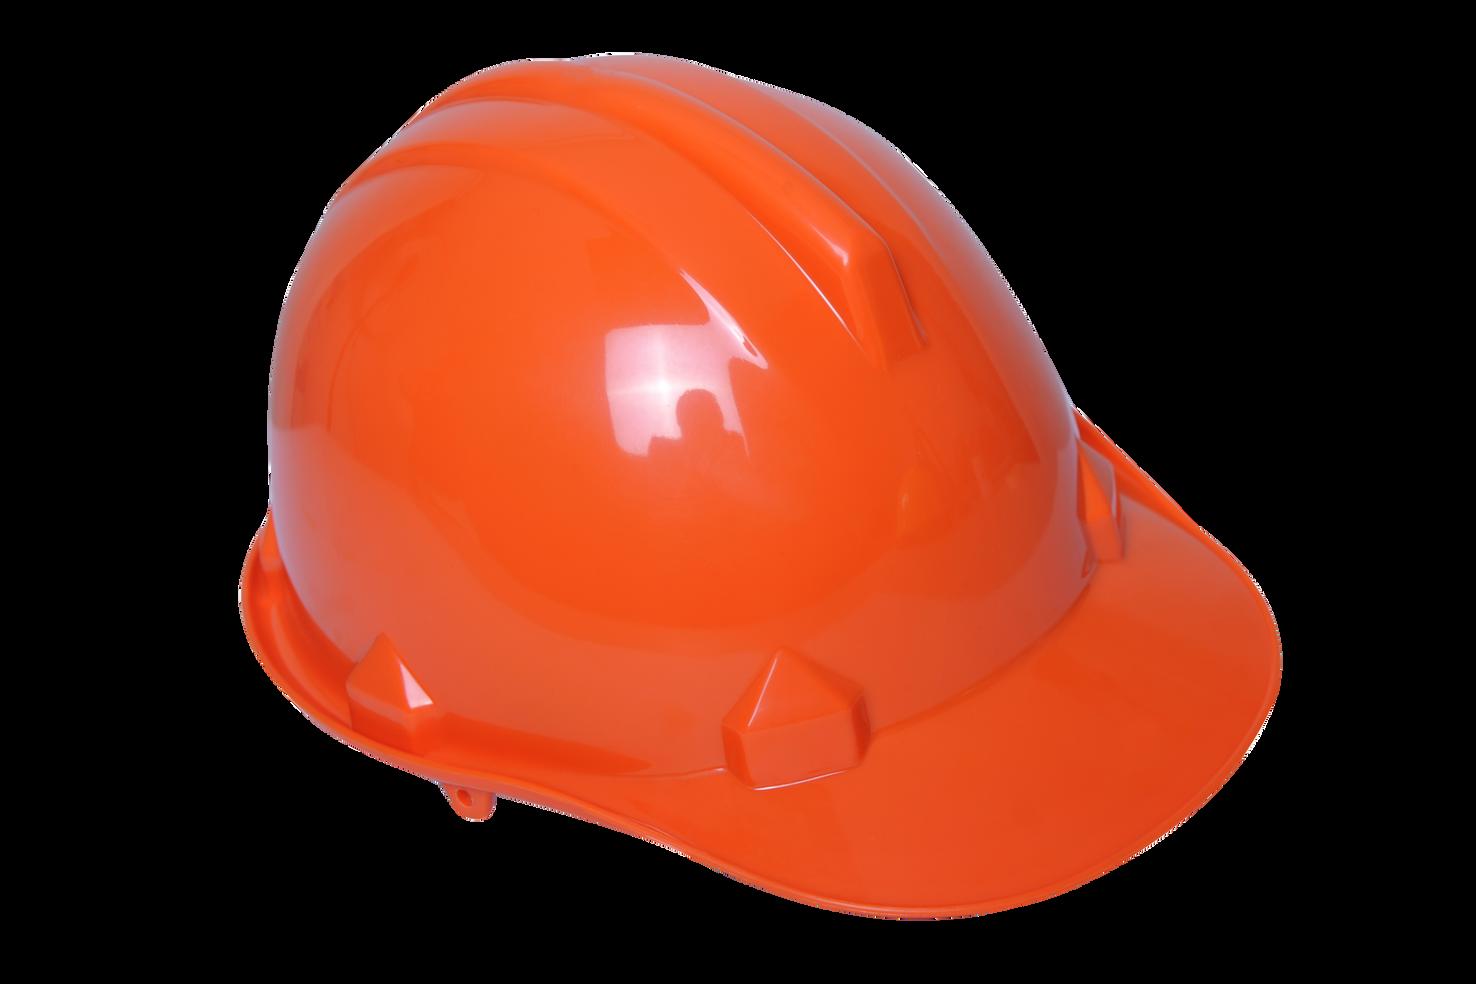 Hardhat orange